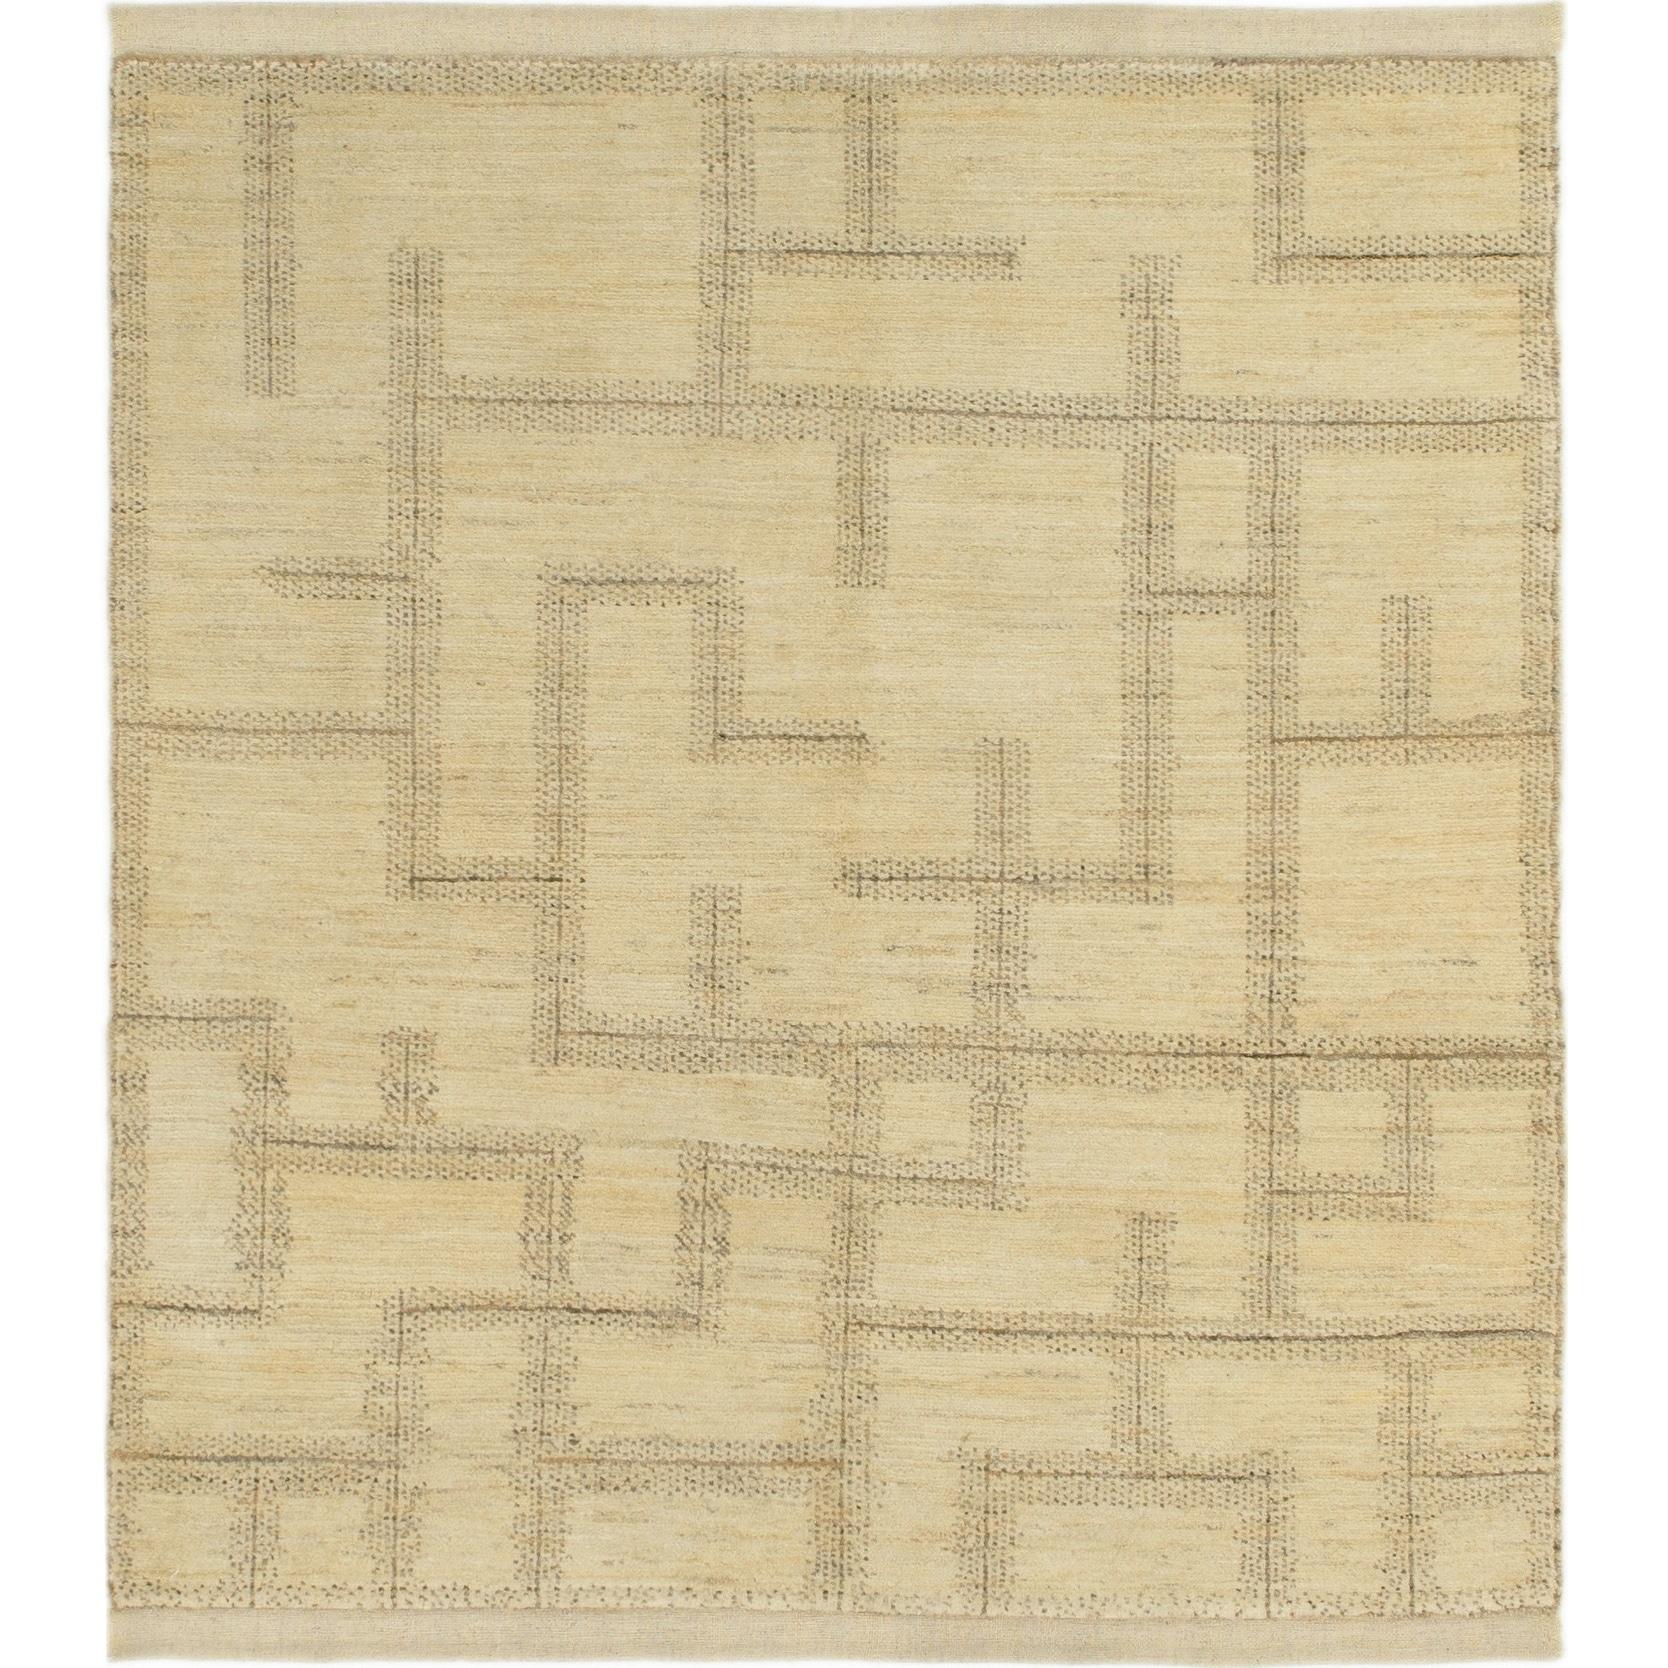 Hand Knotted Kashkuli Gabbeh Wool Square Rug - 5 x 5 8 (Cream - 5 x 5 8)